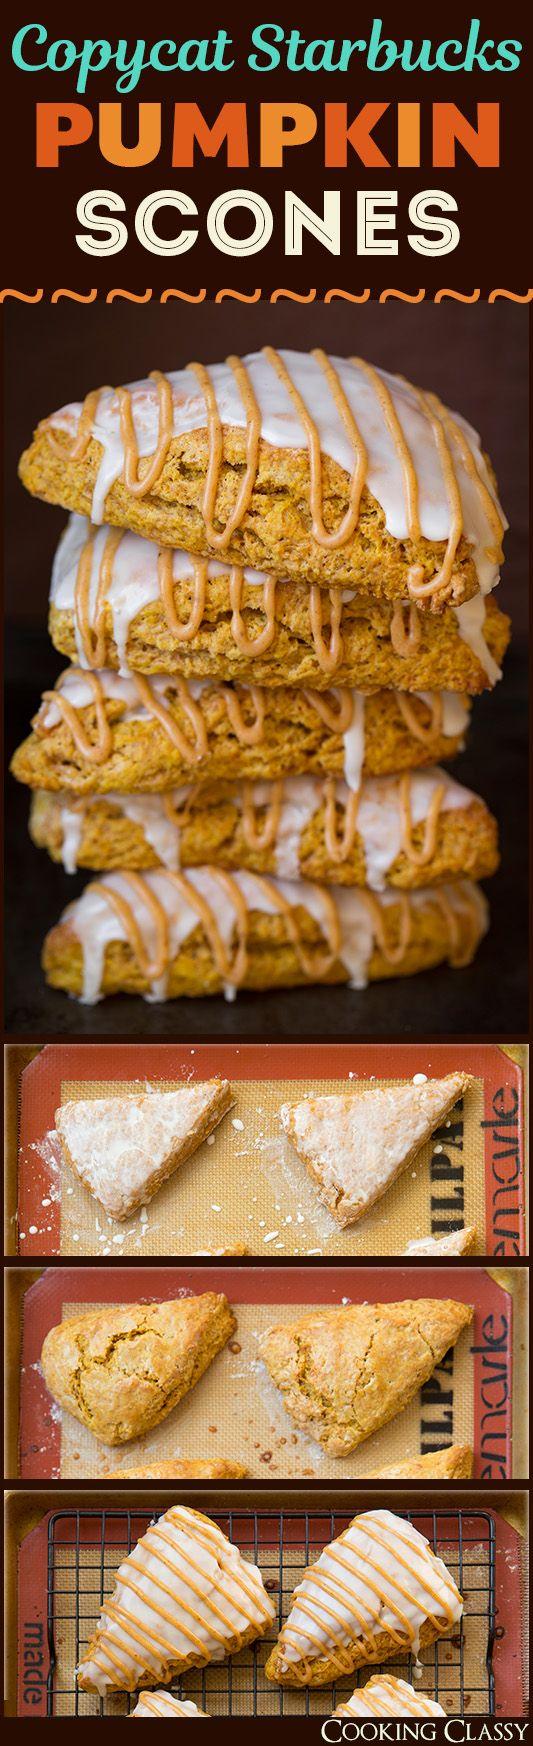 Pumpkin Scones {Starbucks Copycat} - Cooking Classy (Fun Fall Bake)